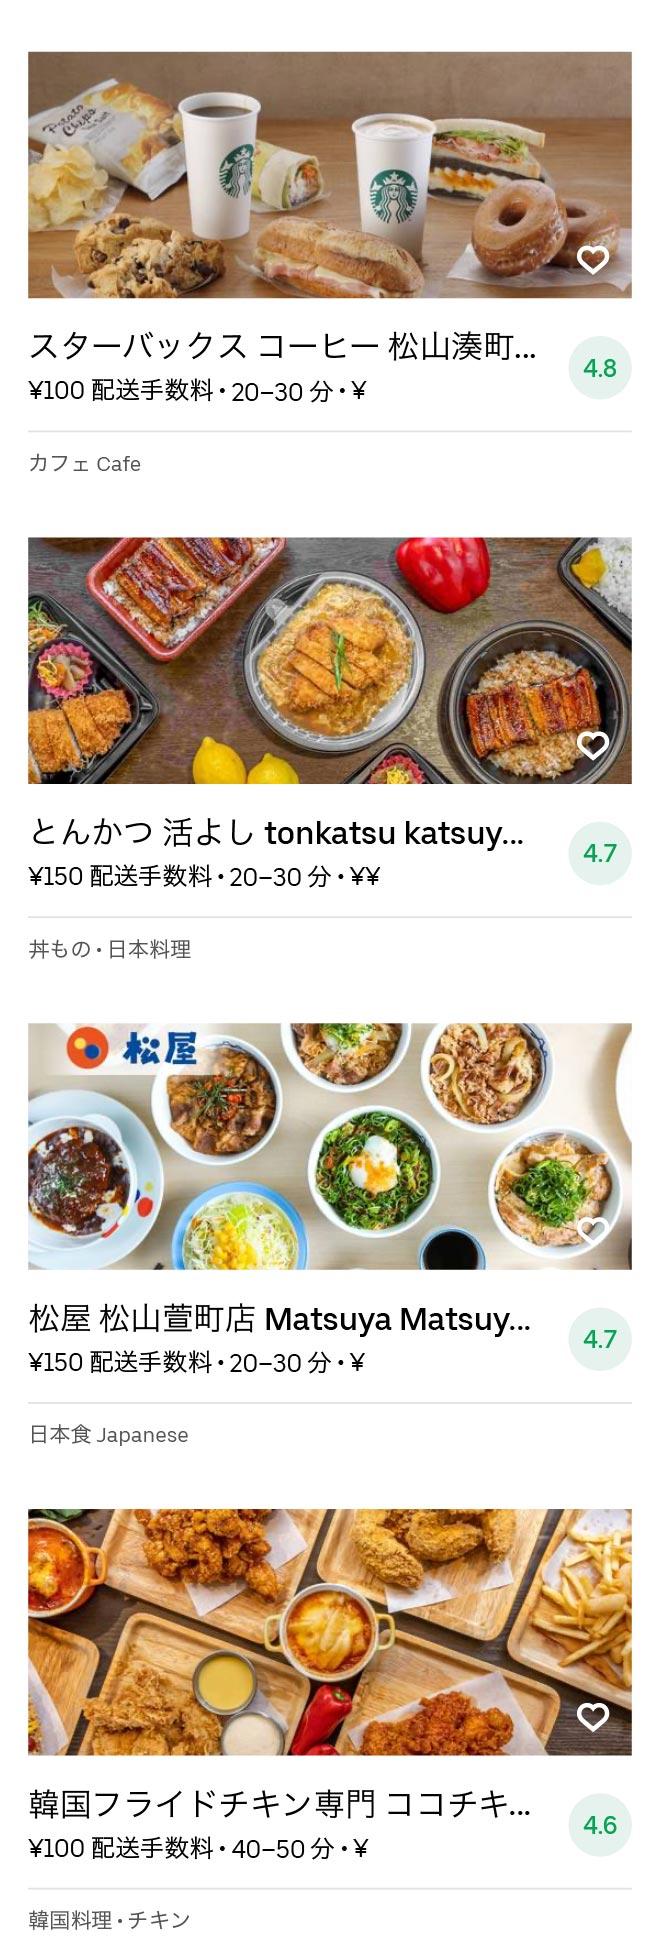 Matsuyama menu 2010 04